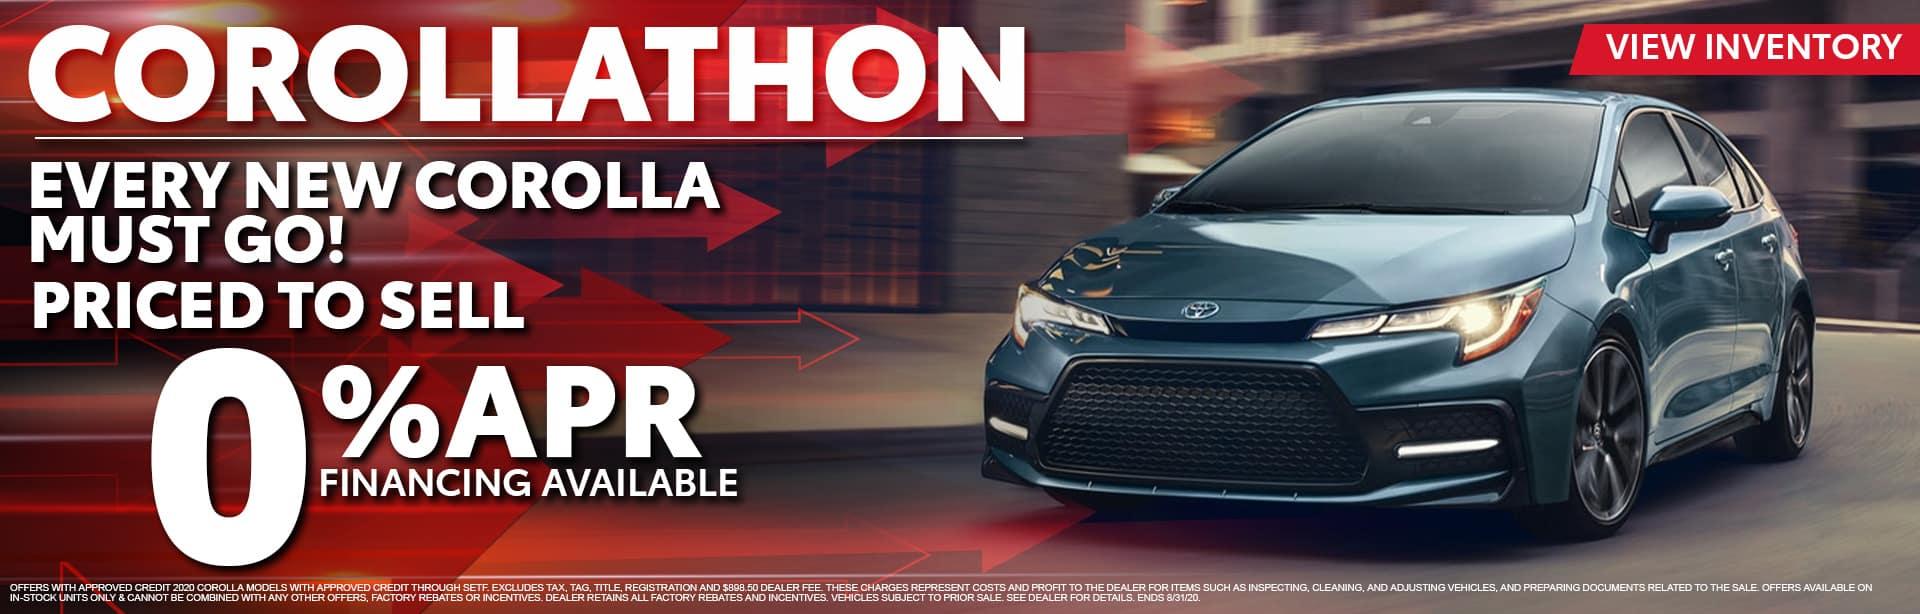 Corollathon is On at Bev Smith Toyota!